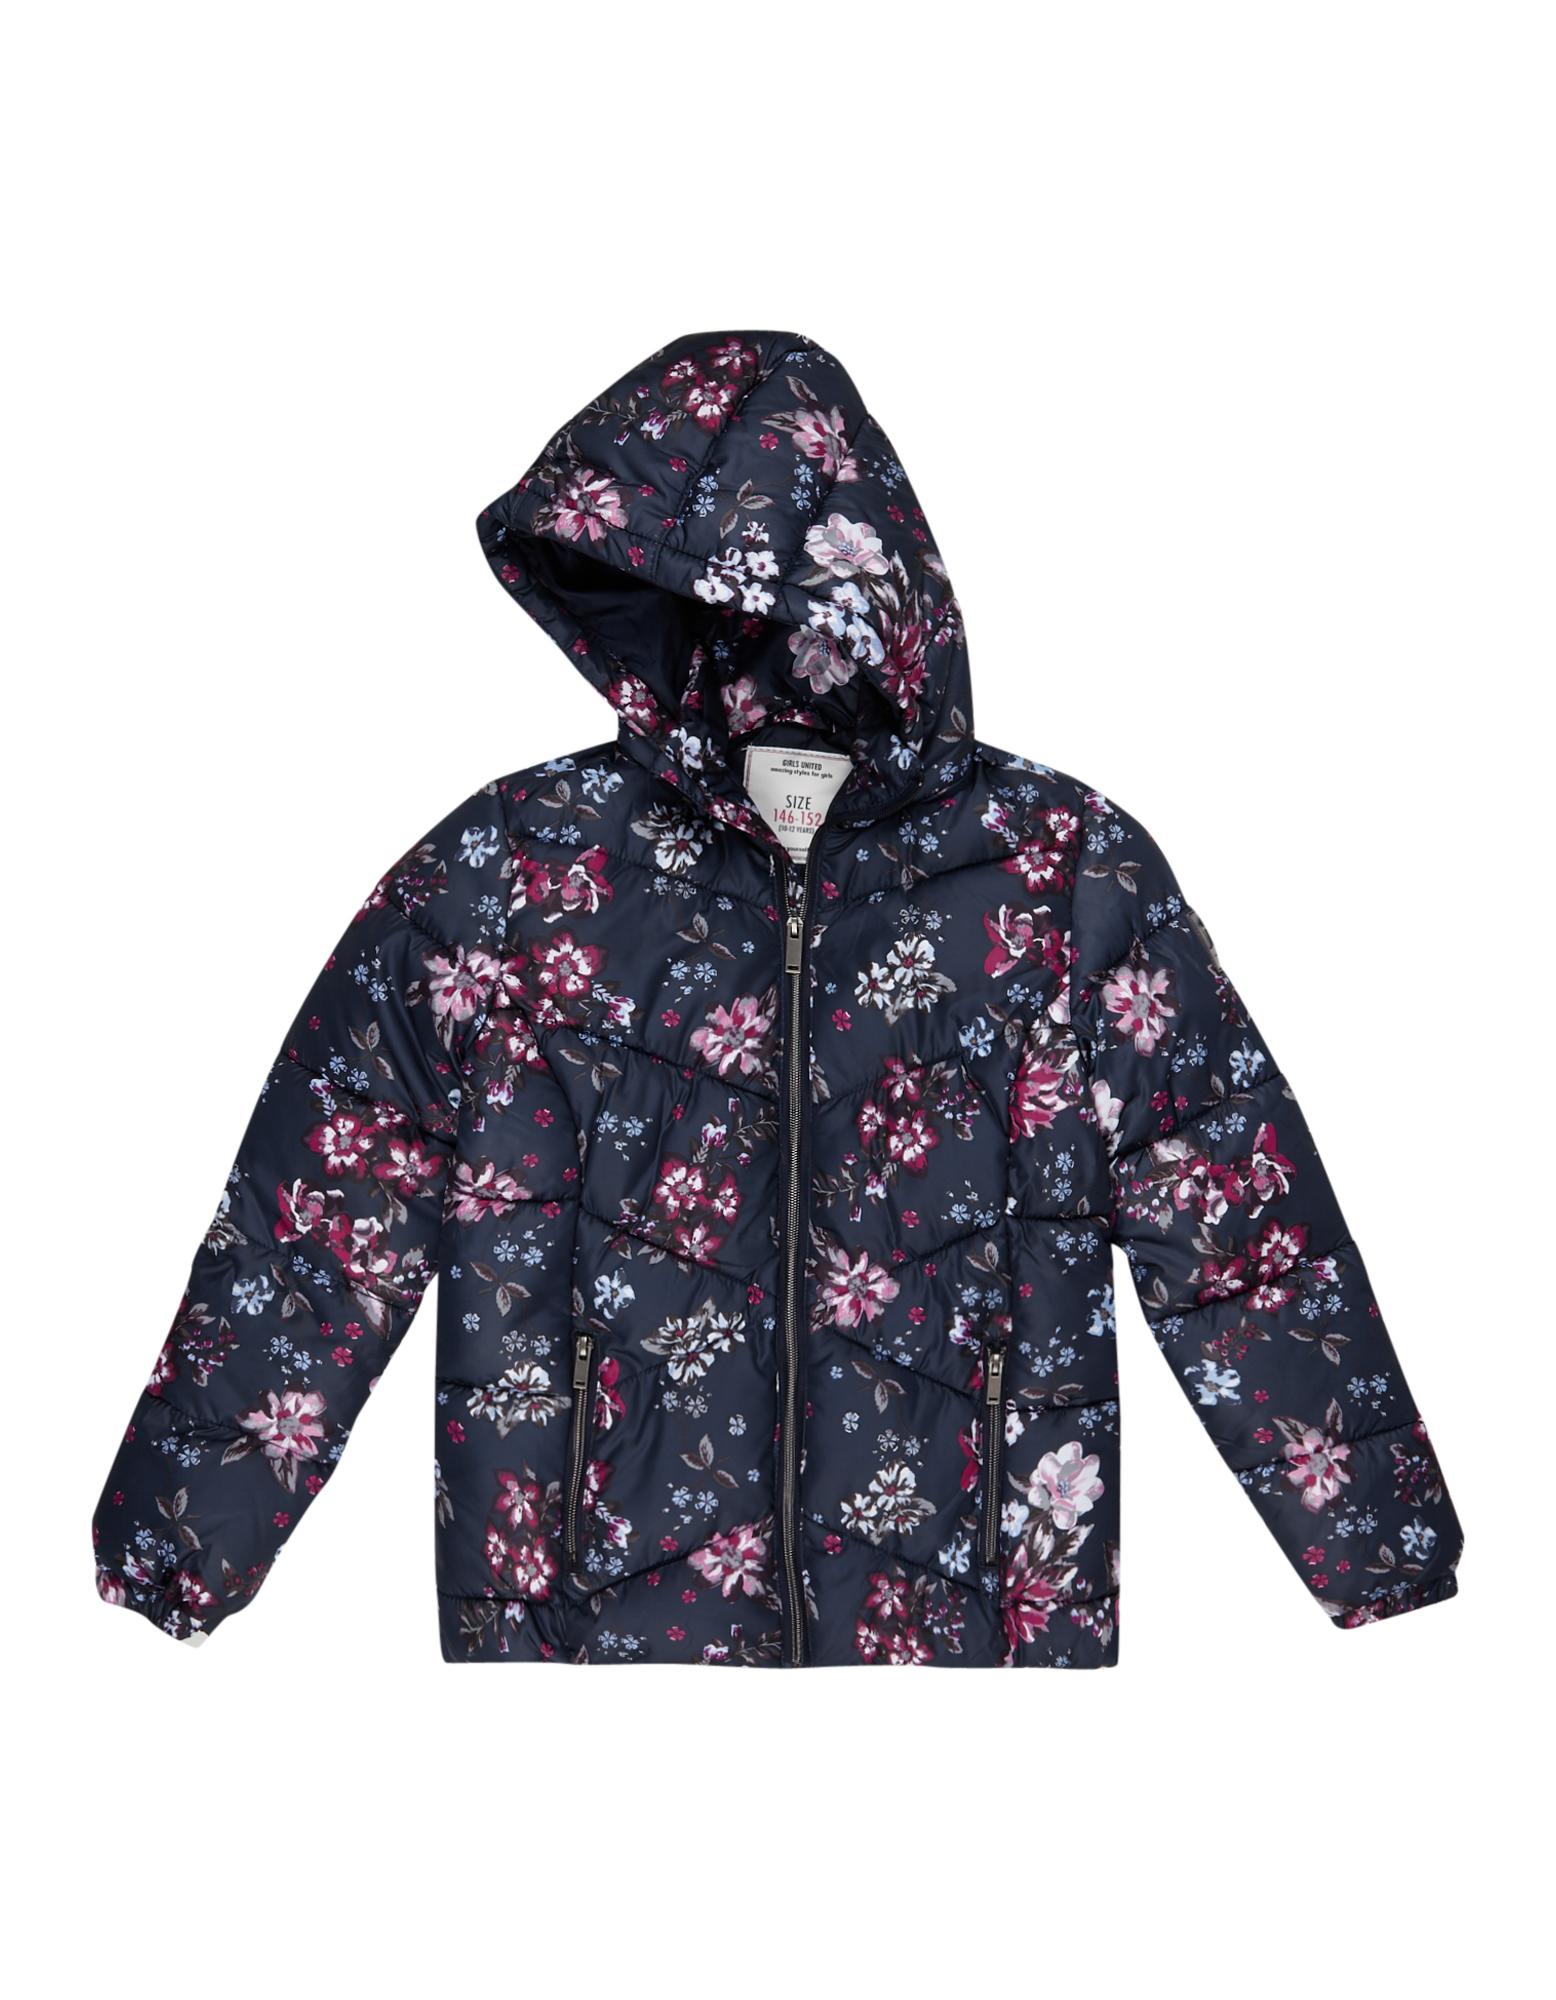 Mädchen Steppjacke mit floralem Allover-Muster    81481785750307